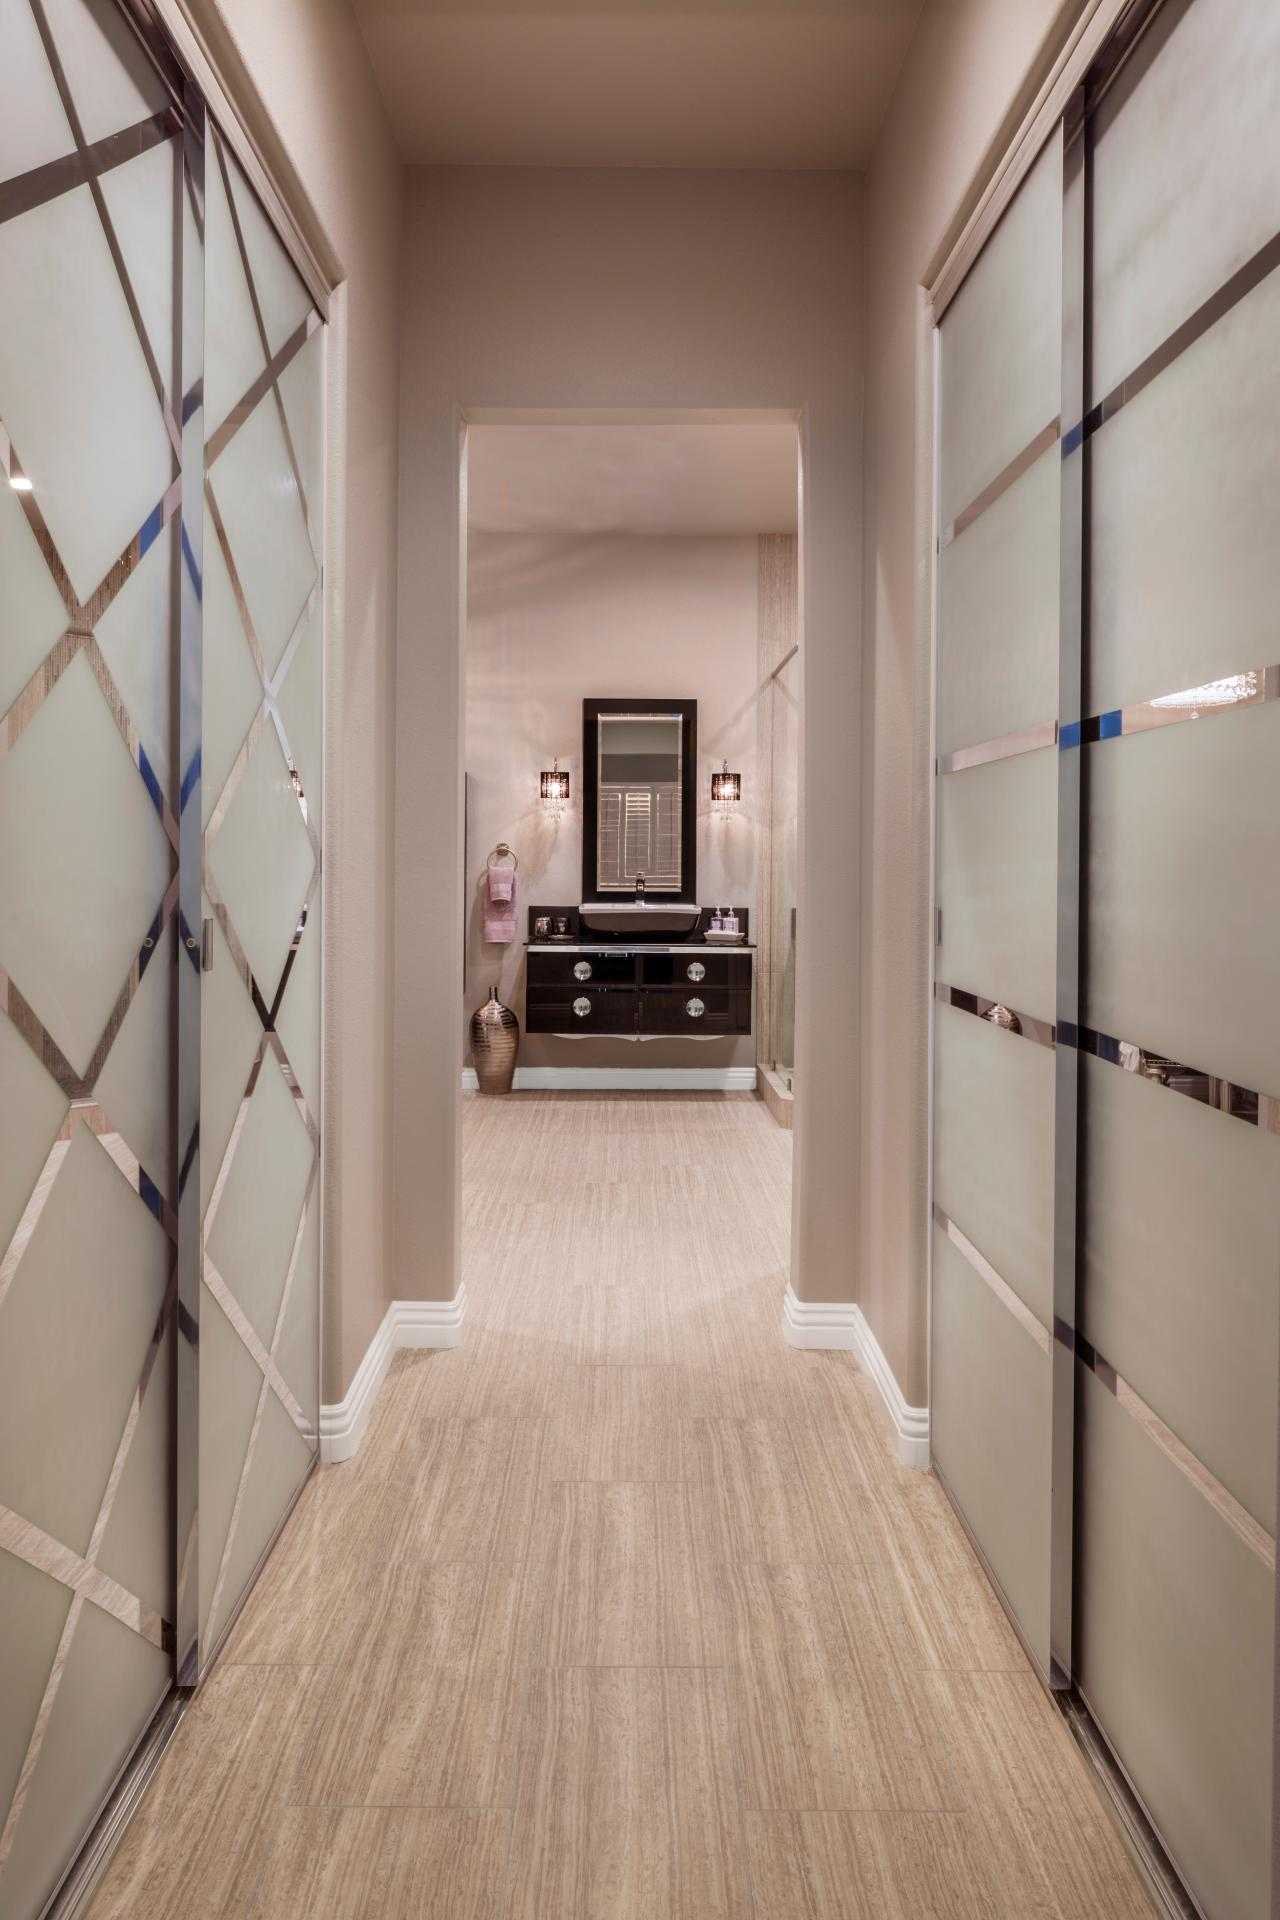 Give Bland Closet Doors A Designer Upgrade Hgtv S